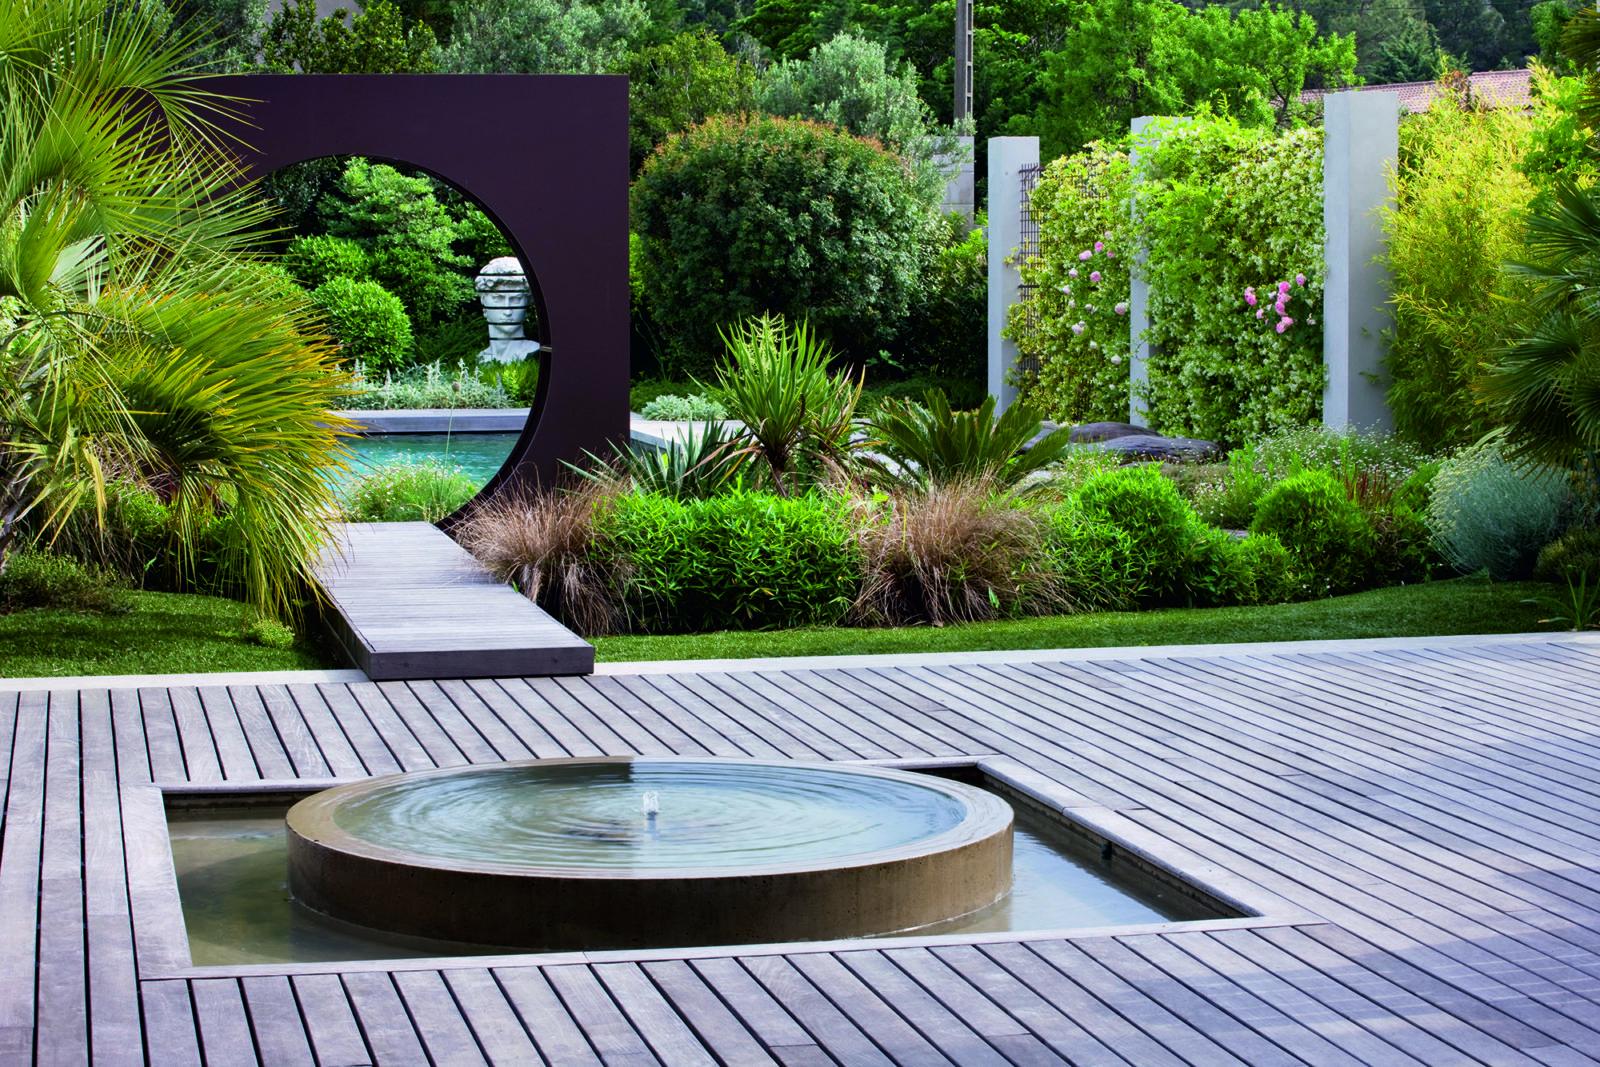 Aménagement De Terrasse Extérieure - Lantana Paysage avec Amenagement De Terrasse Exterieure